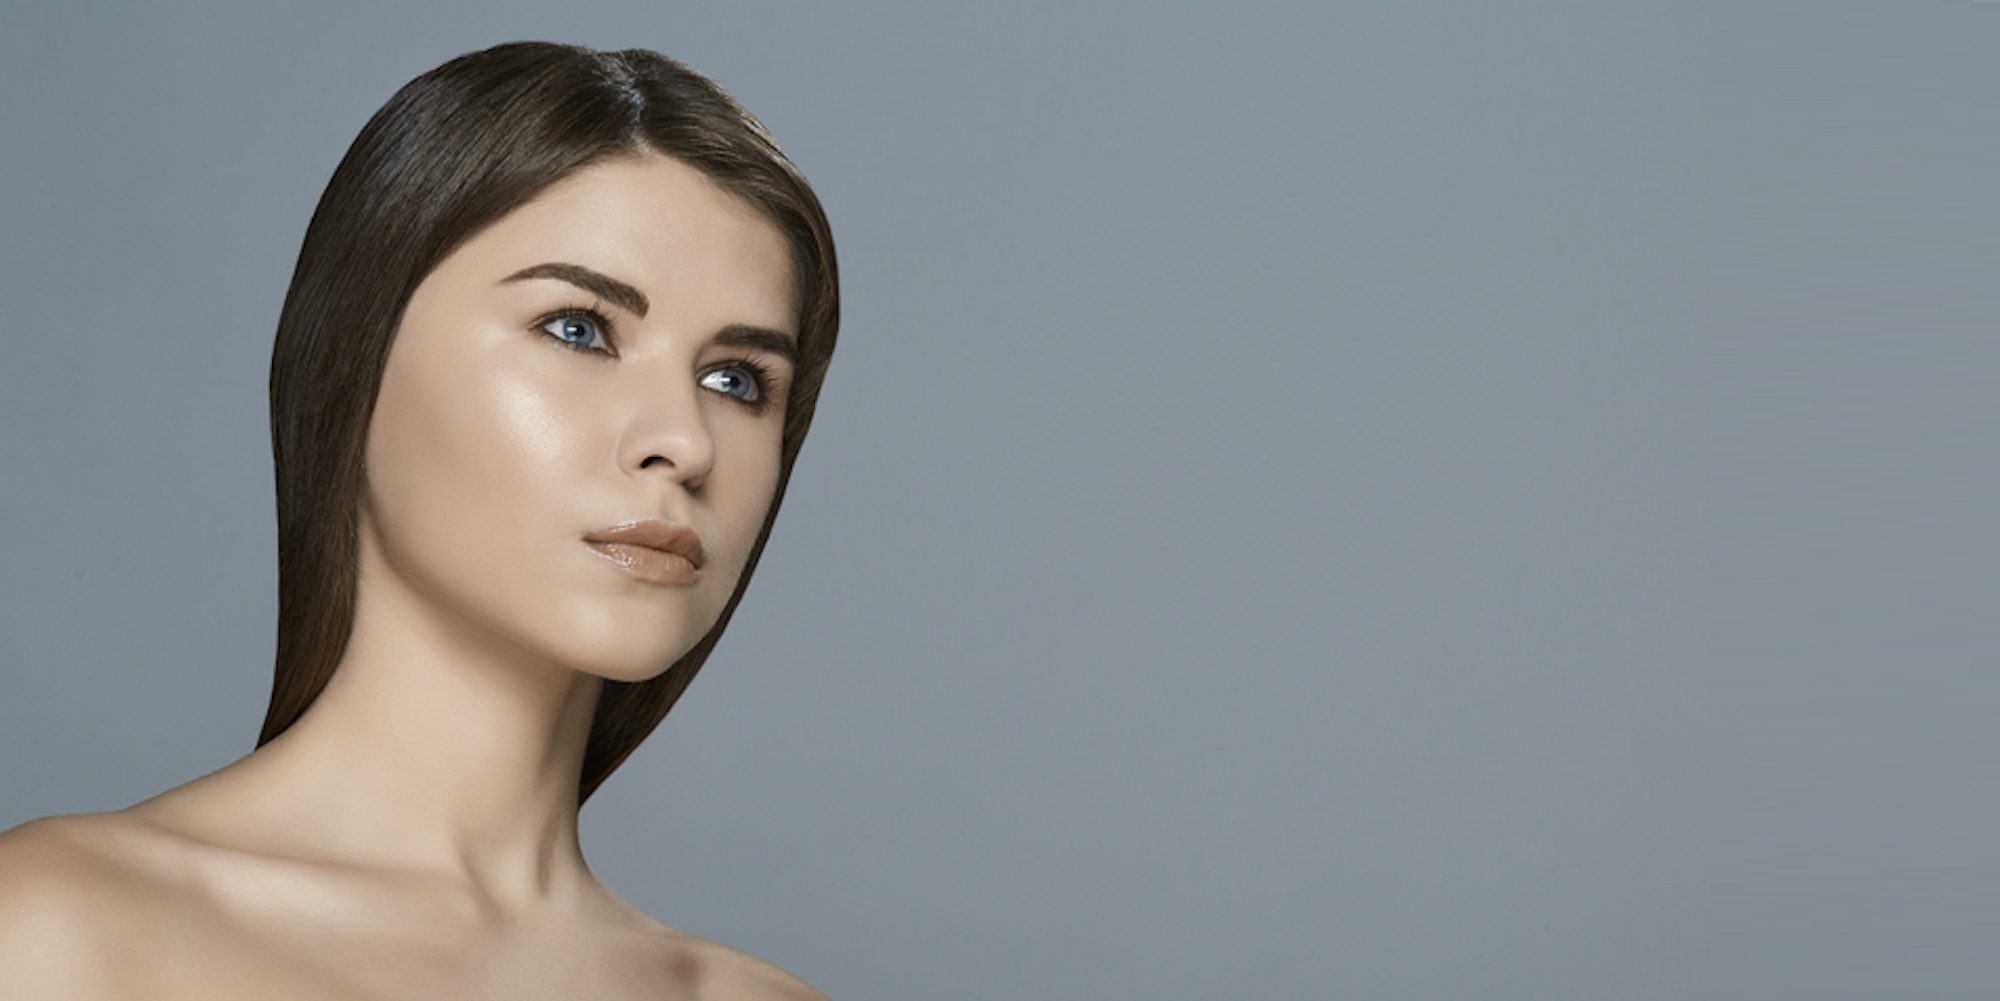 fotografo moda roma beauty fashion 8